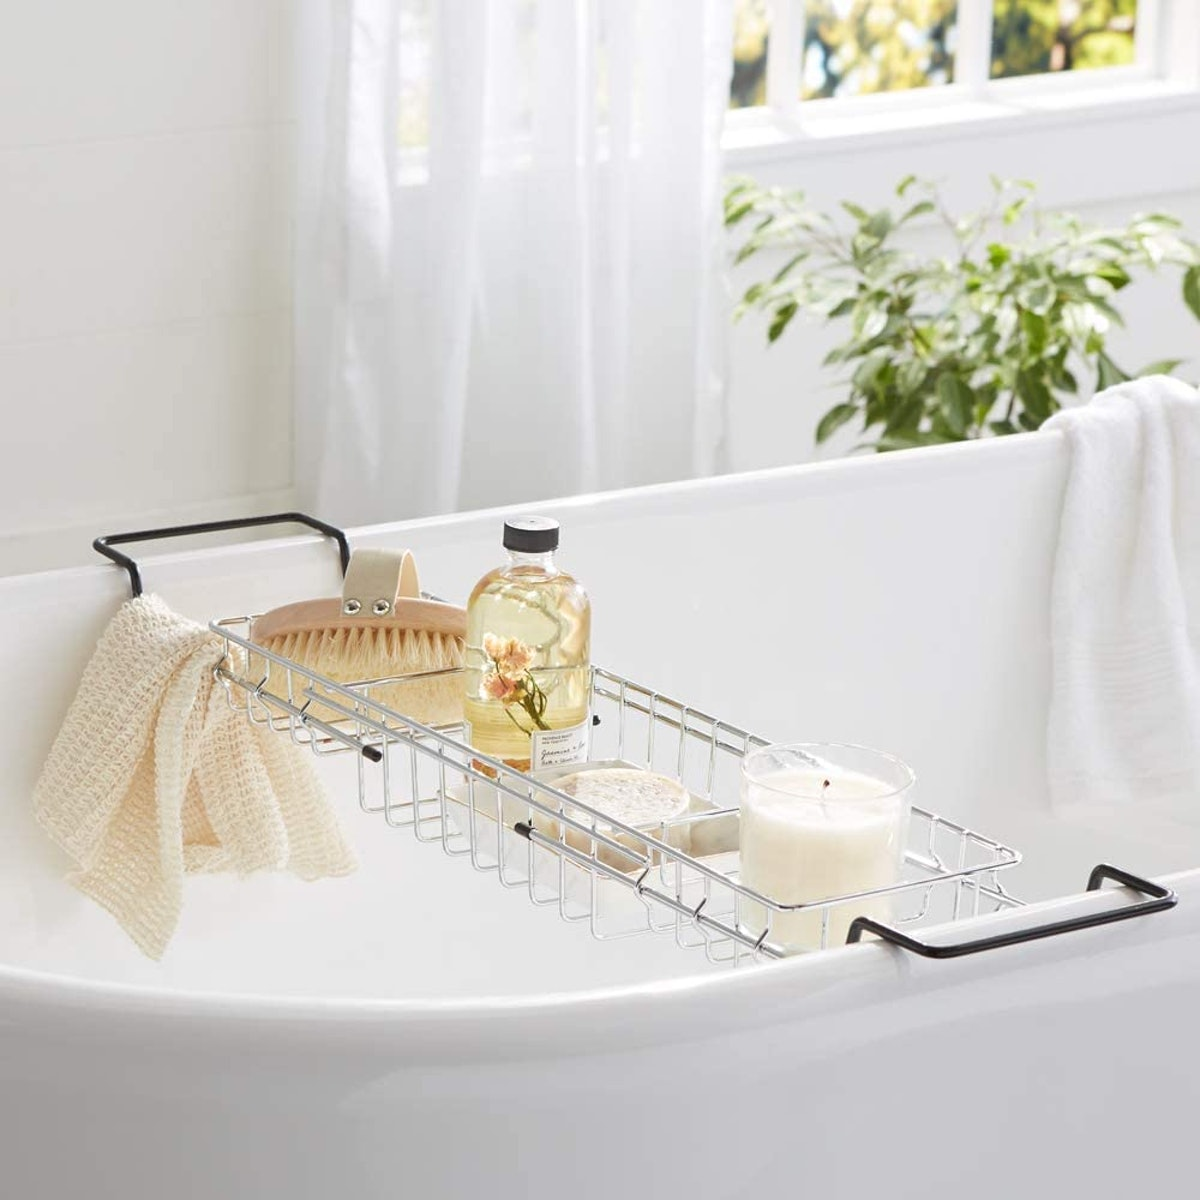 AmazonBasics Wire Bathtub Caddy Tray